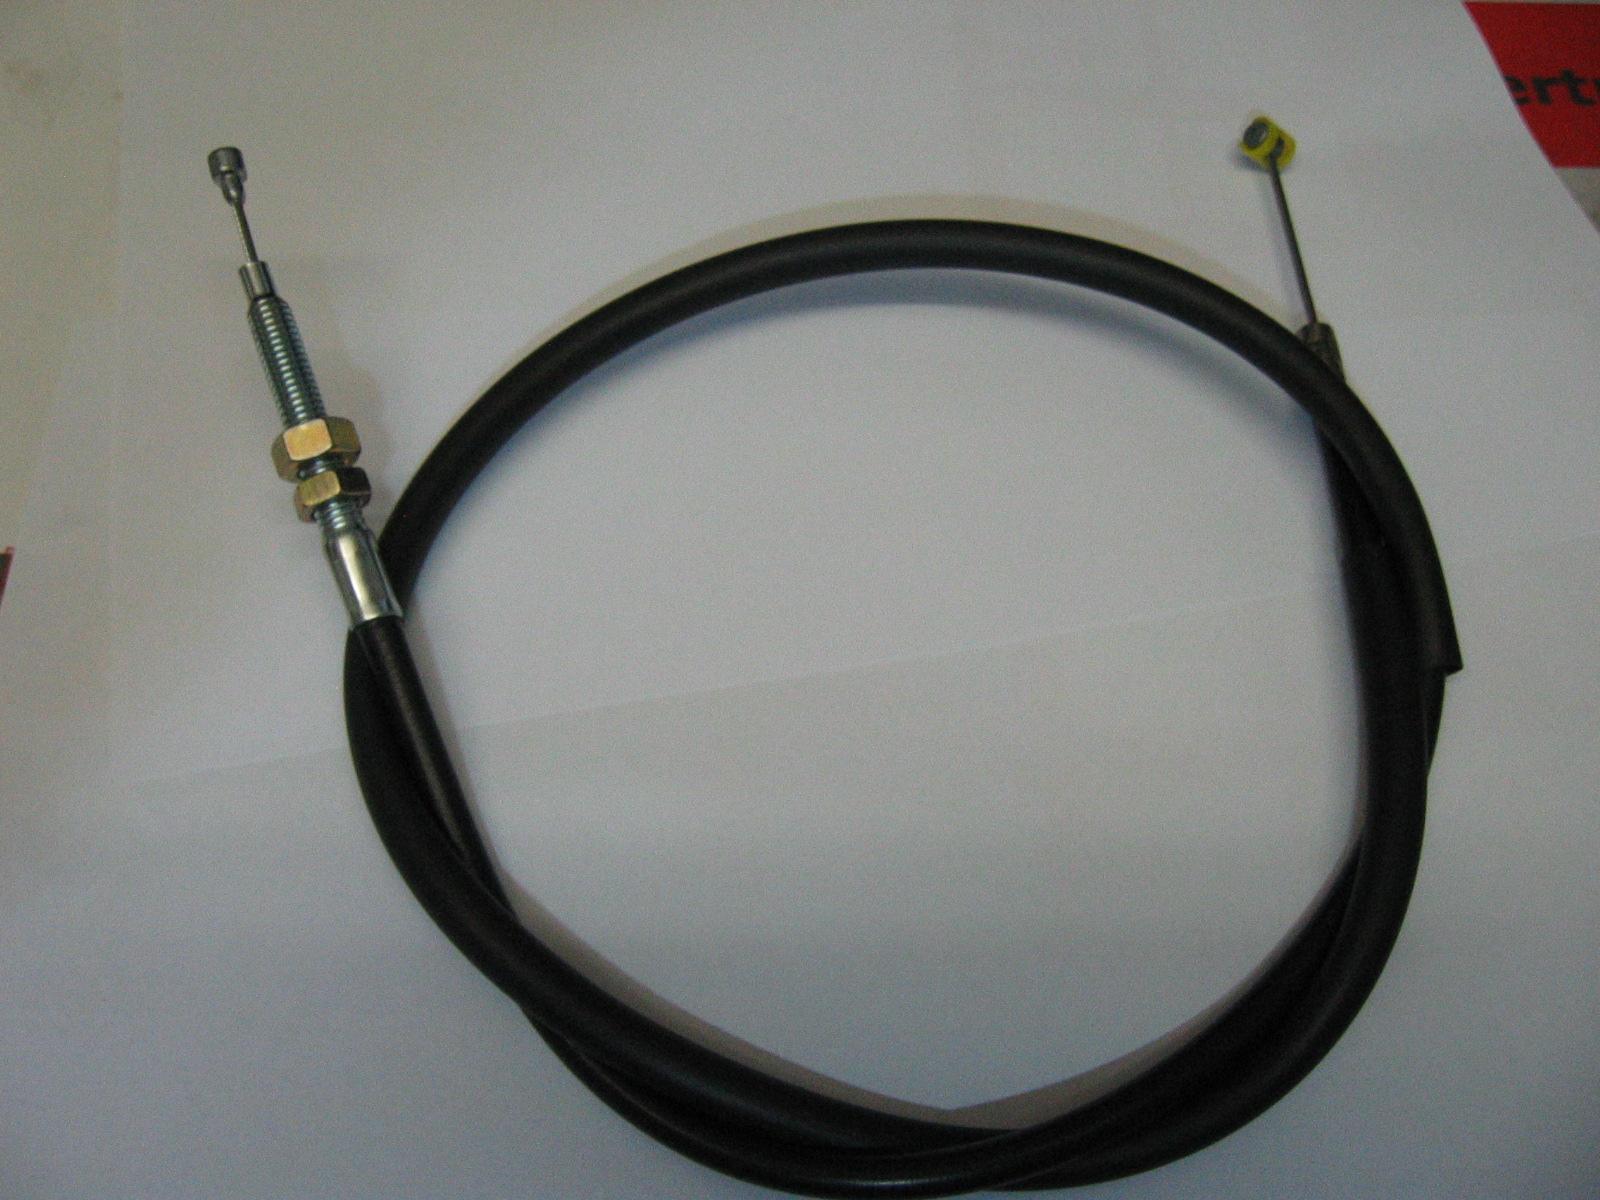 Banshee NOSS Machine Billet Cool Head 64mm to 66.50mm Stock 4mm Cylinders 795